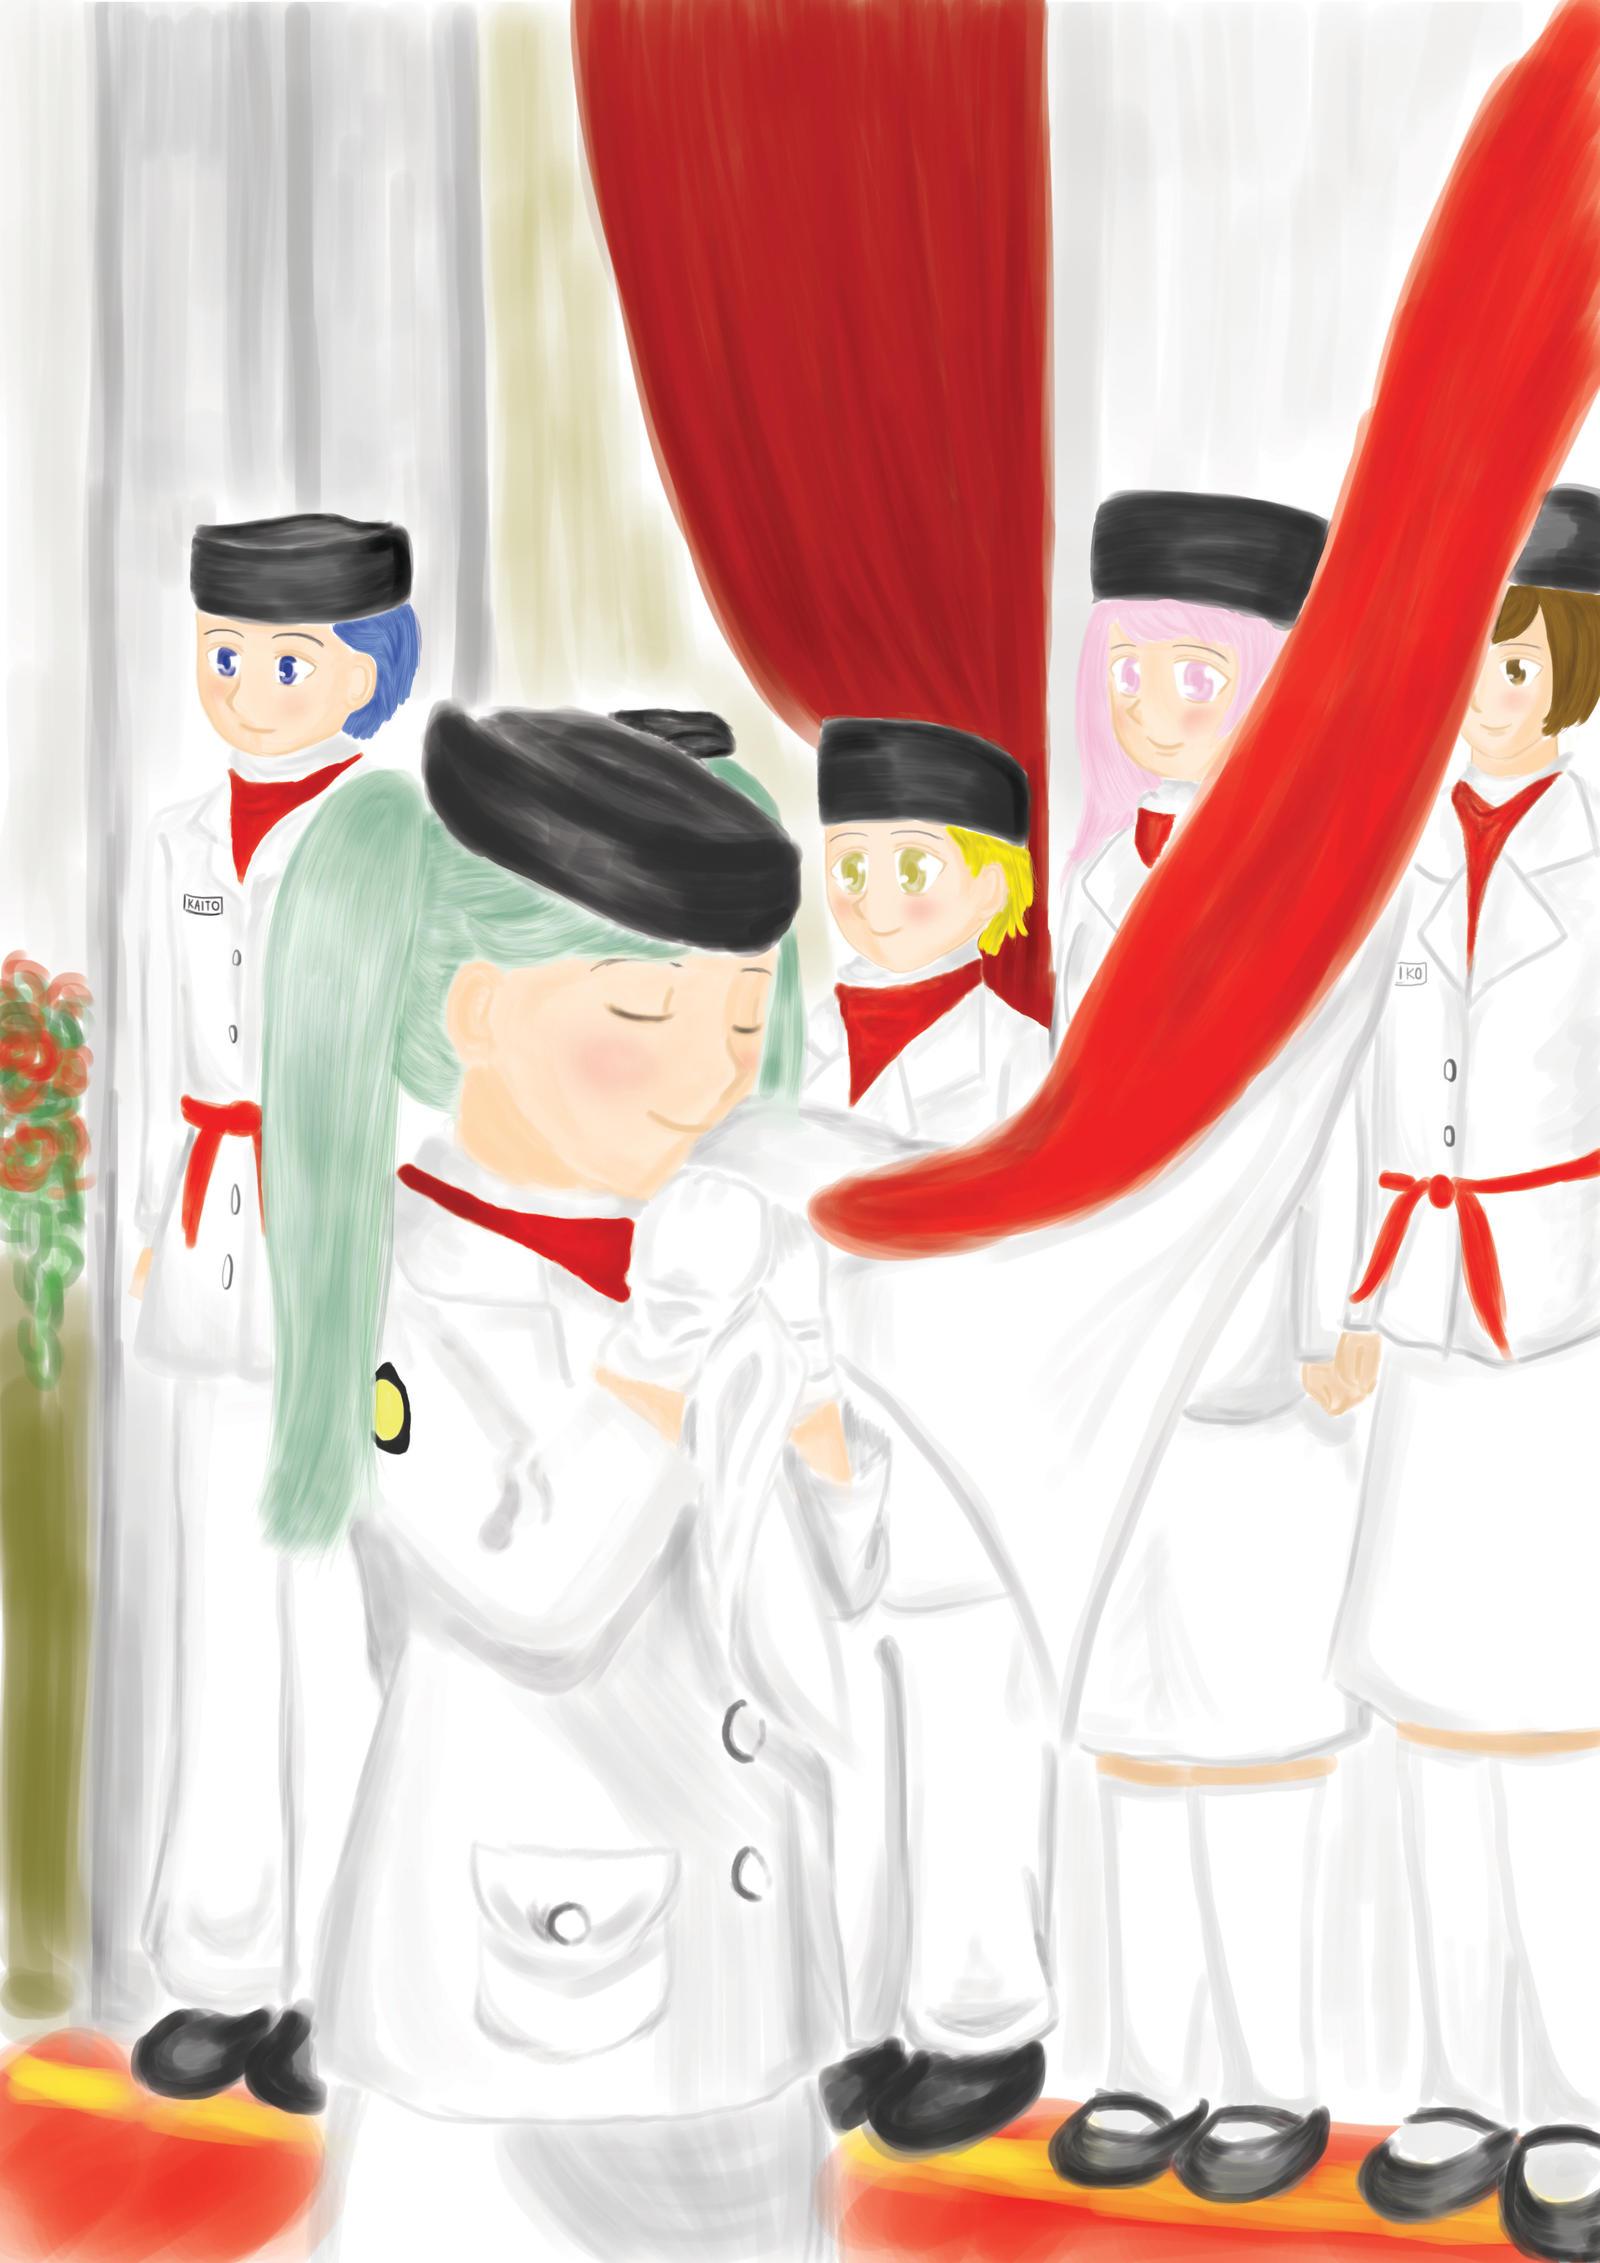 93 Gambar Kartun Anak Memegang Bendera Merah Putih Cikimm Com